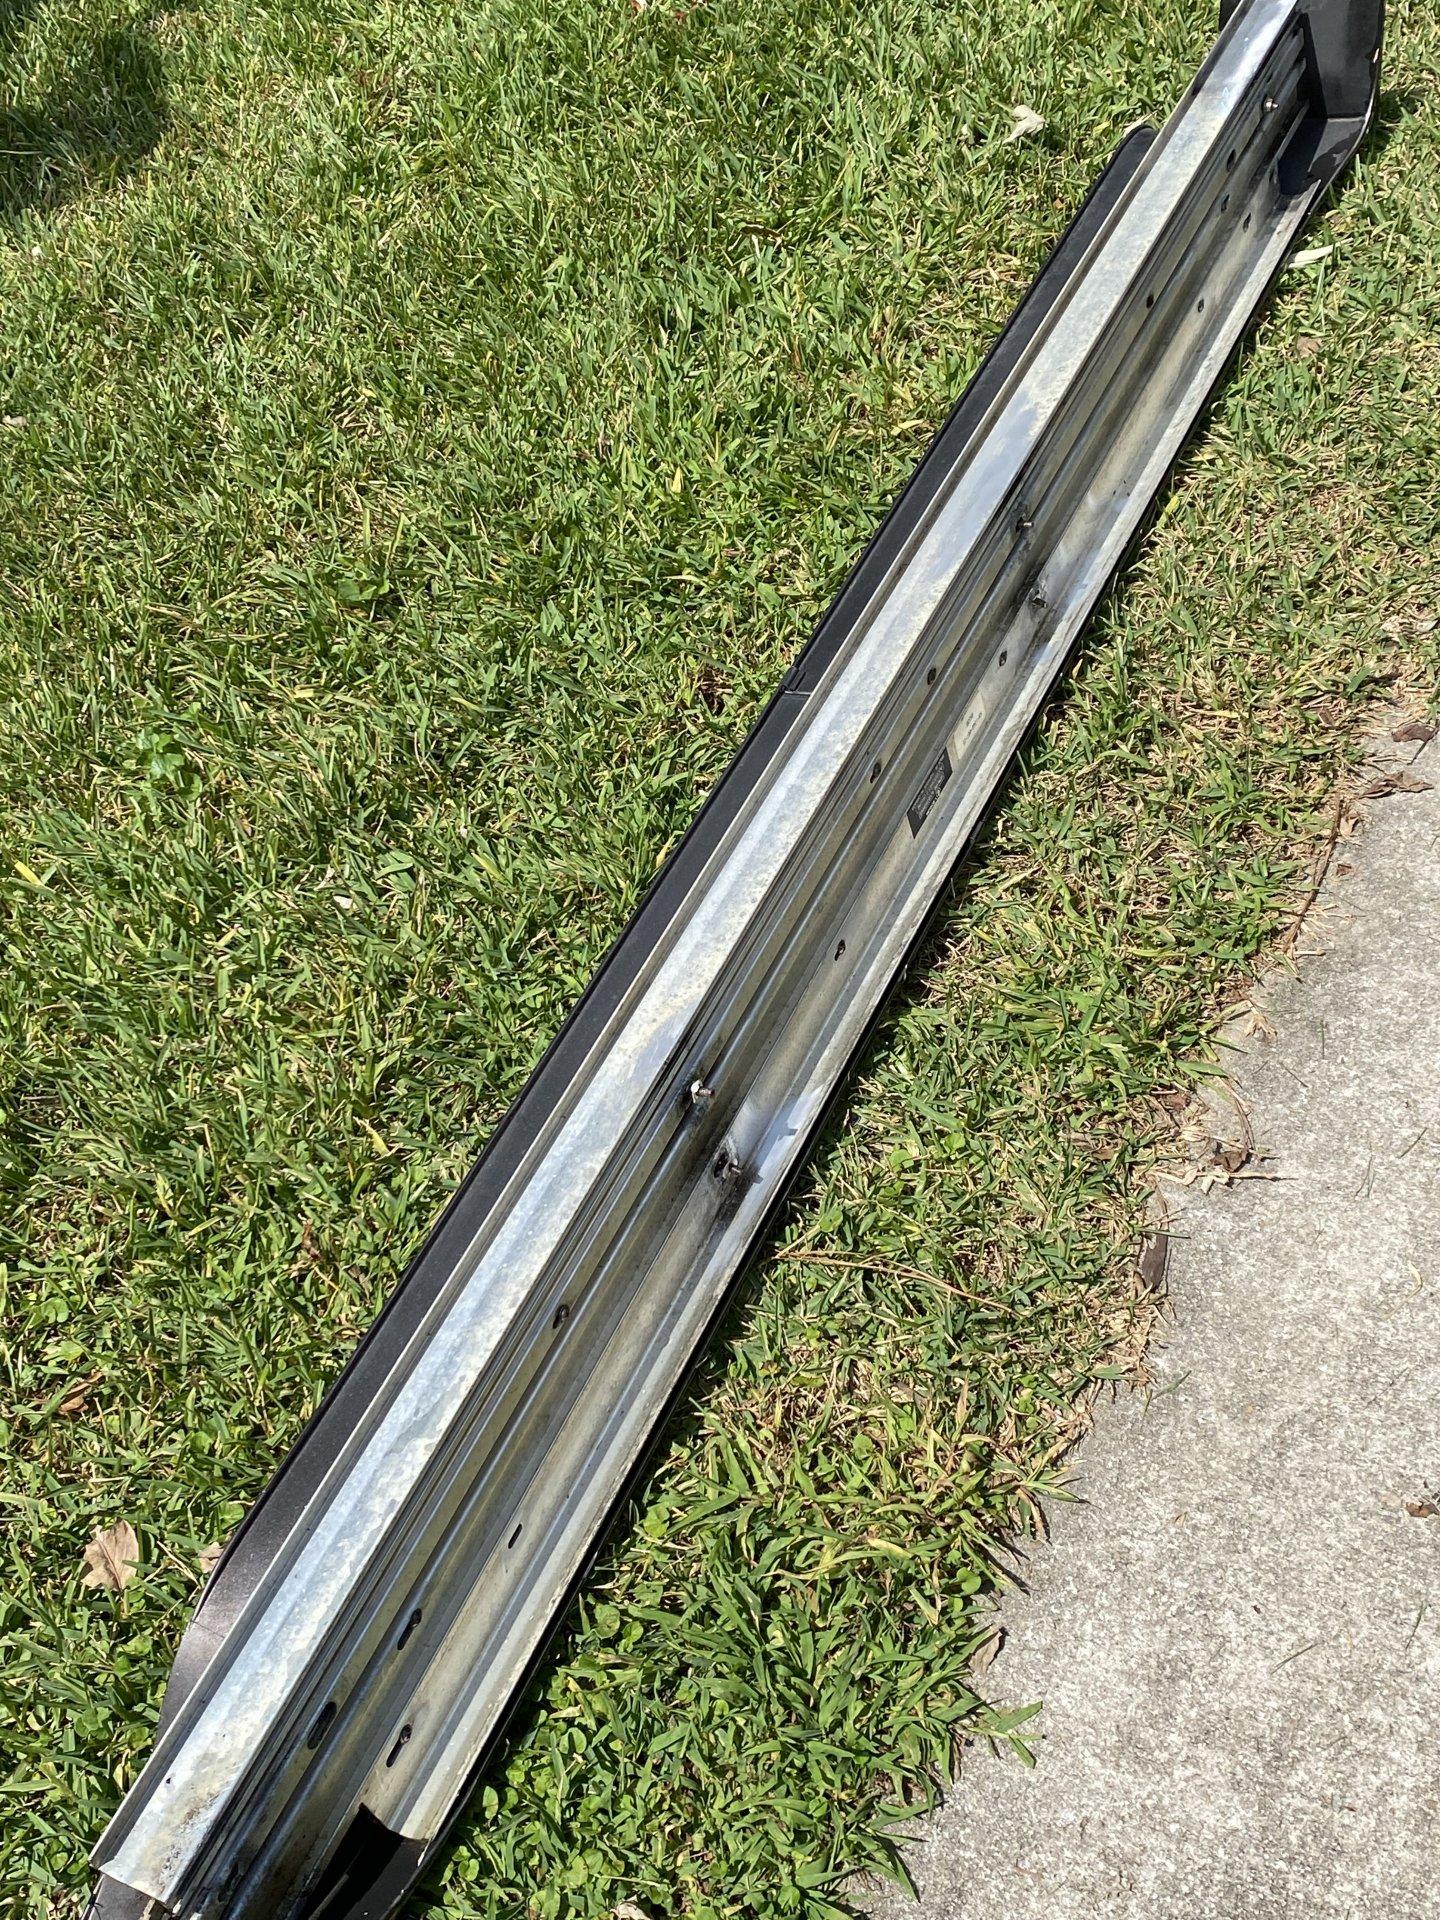 LX 470 Running Board underside.jpeg